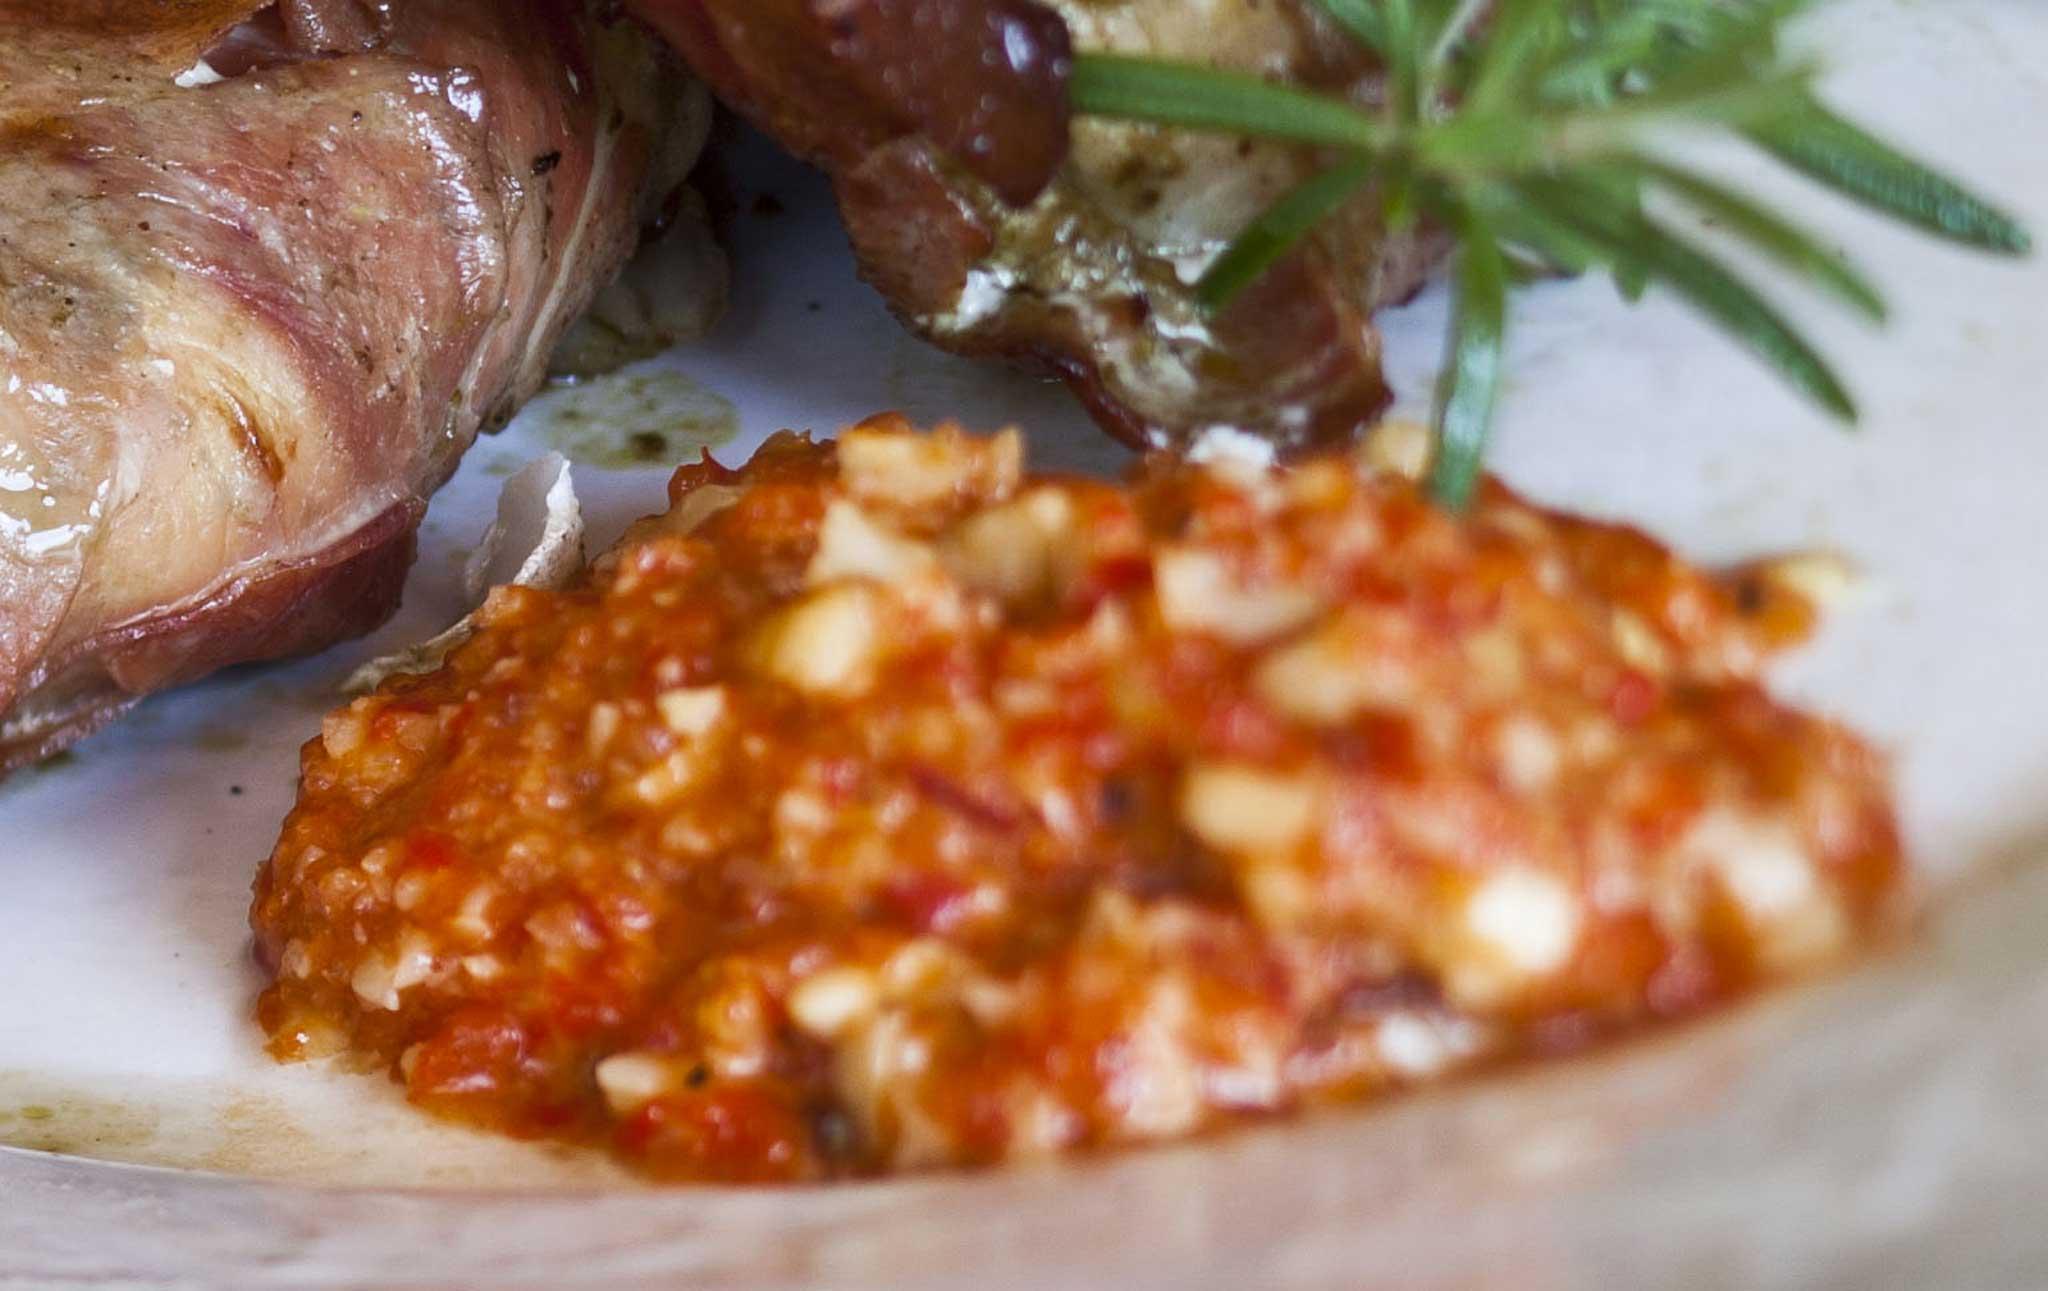 paprika-tomaattikastike pastalle